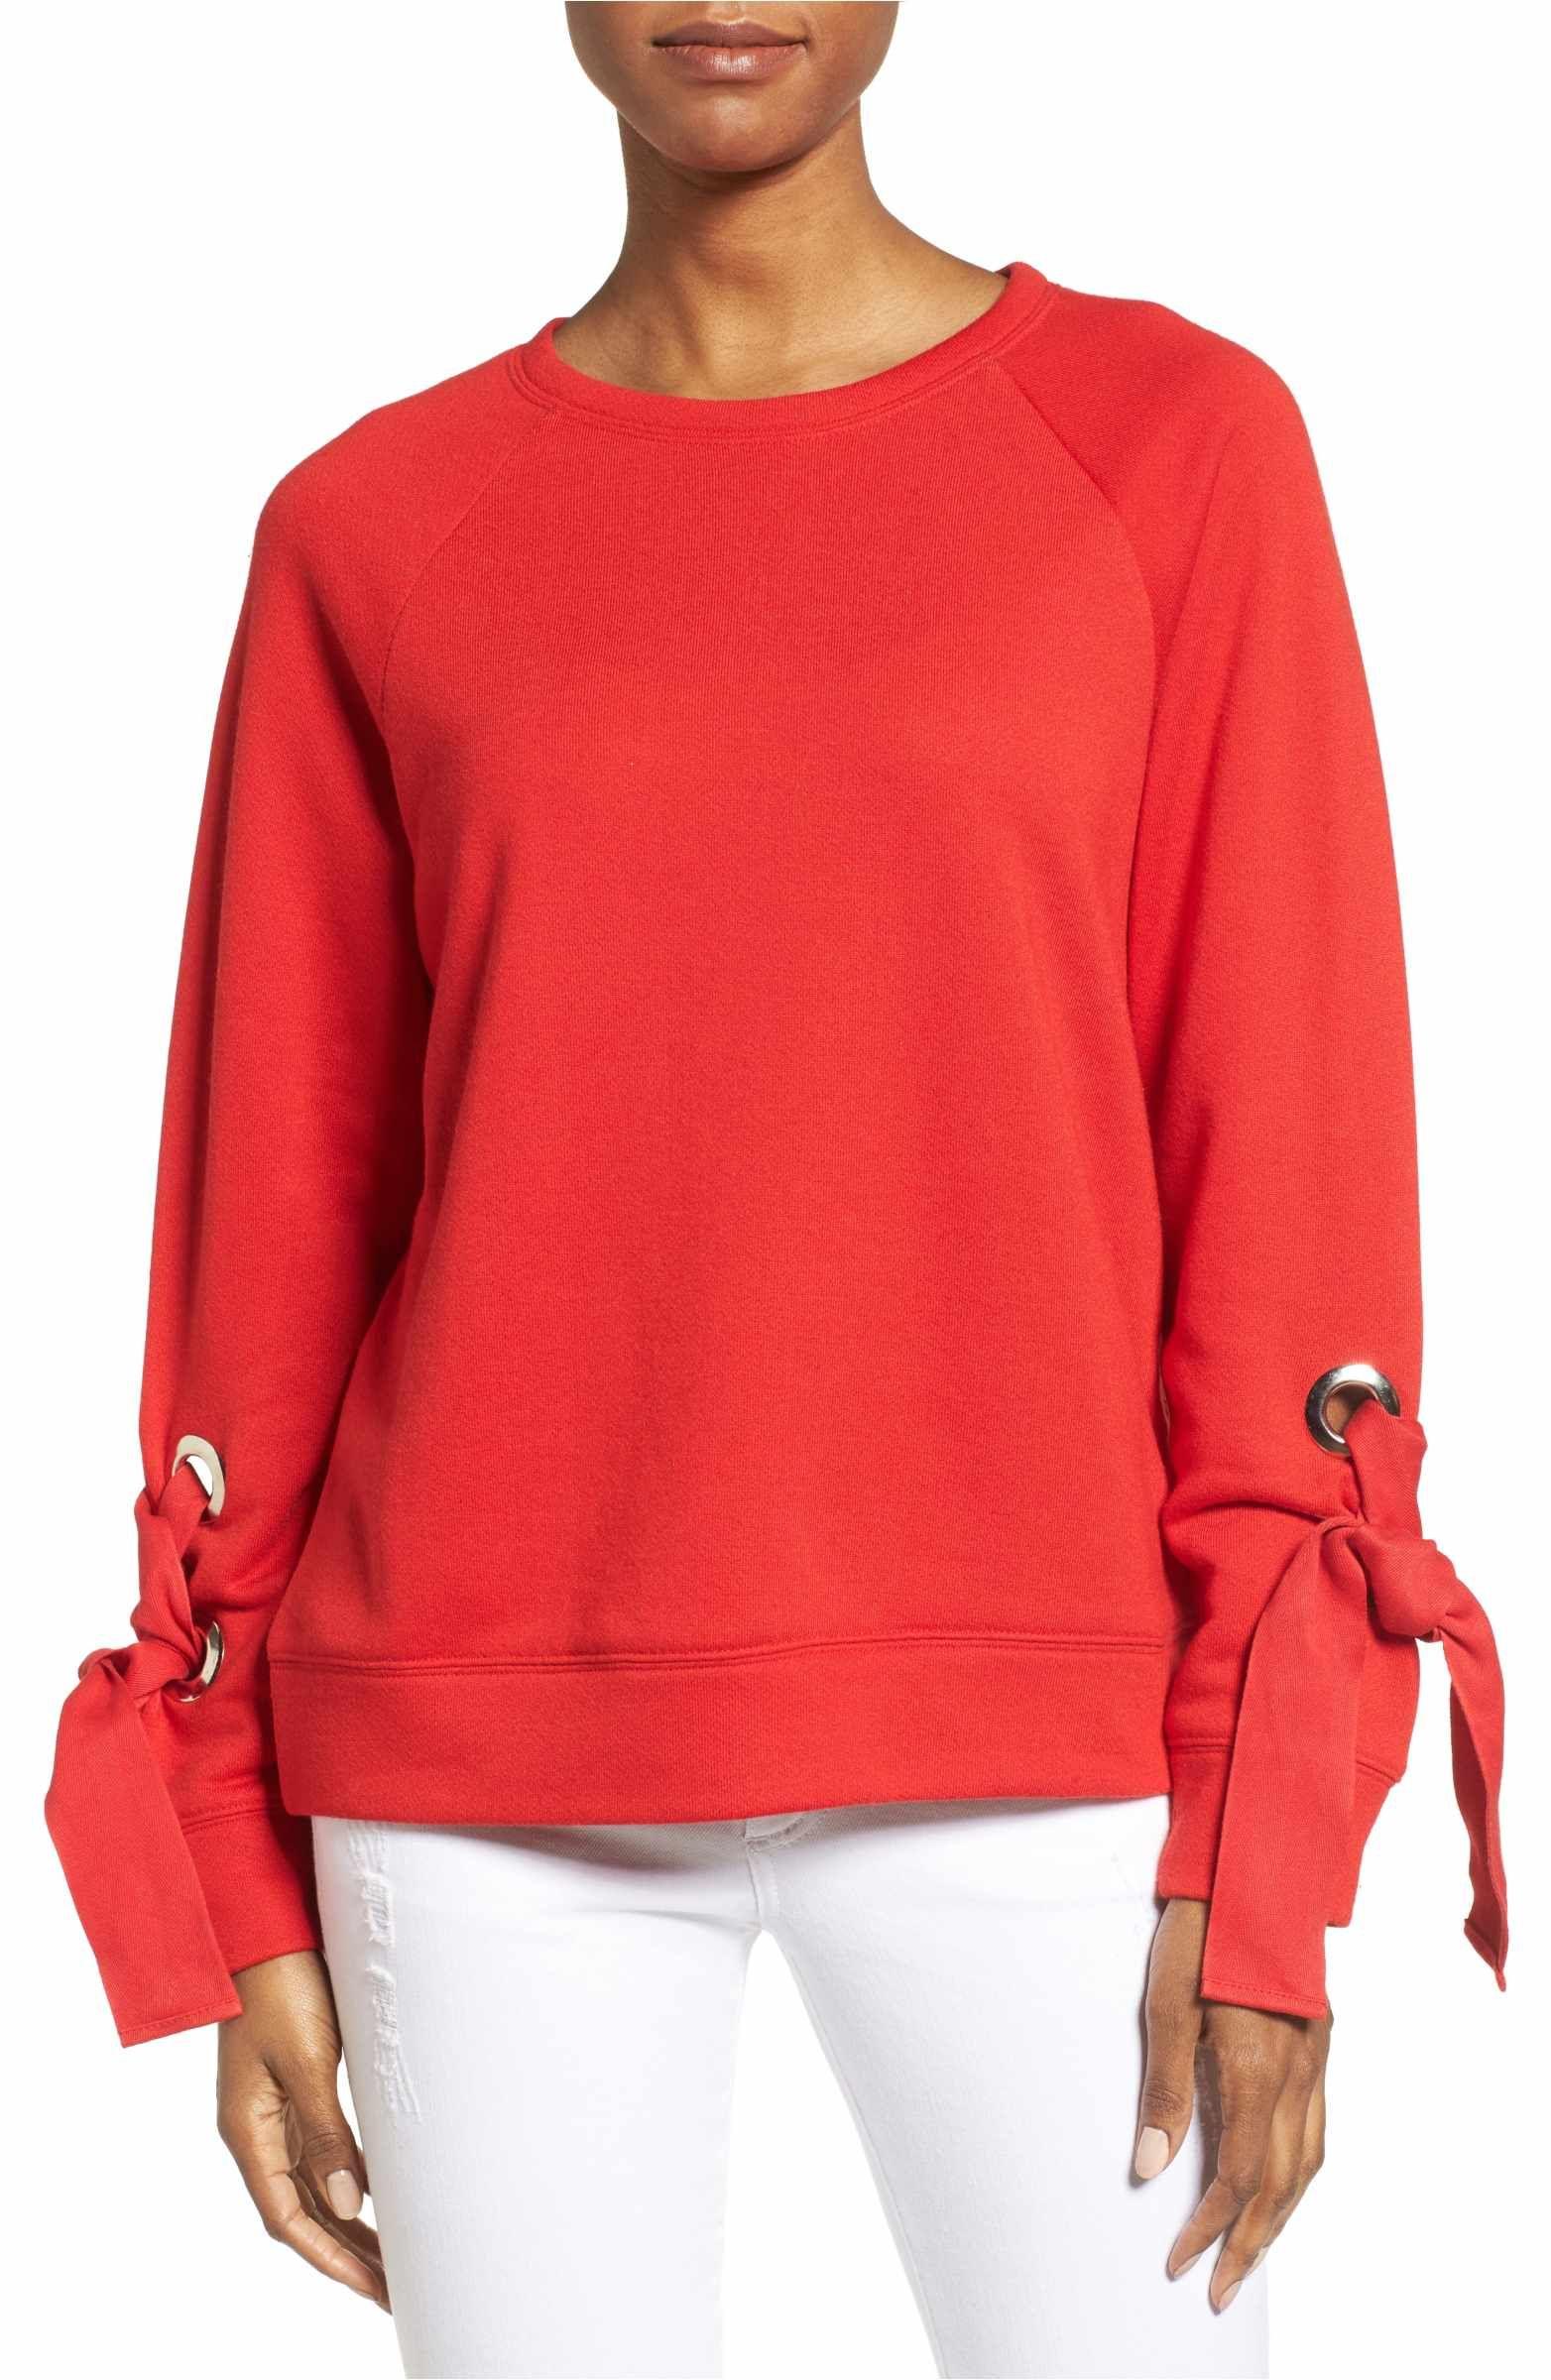 Womens petite sweatshirts